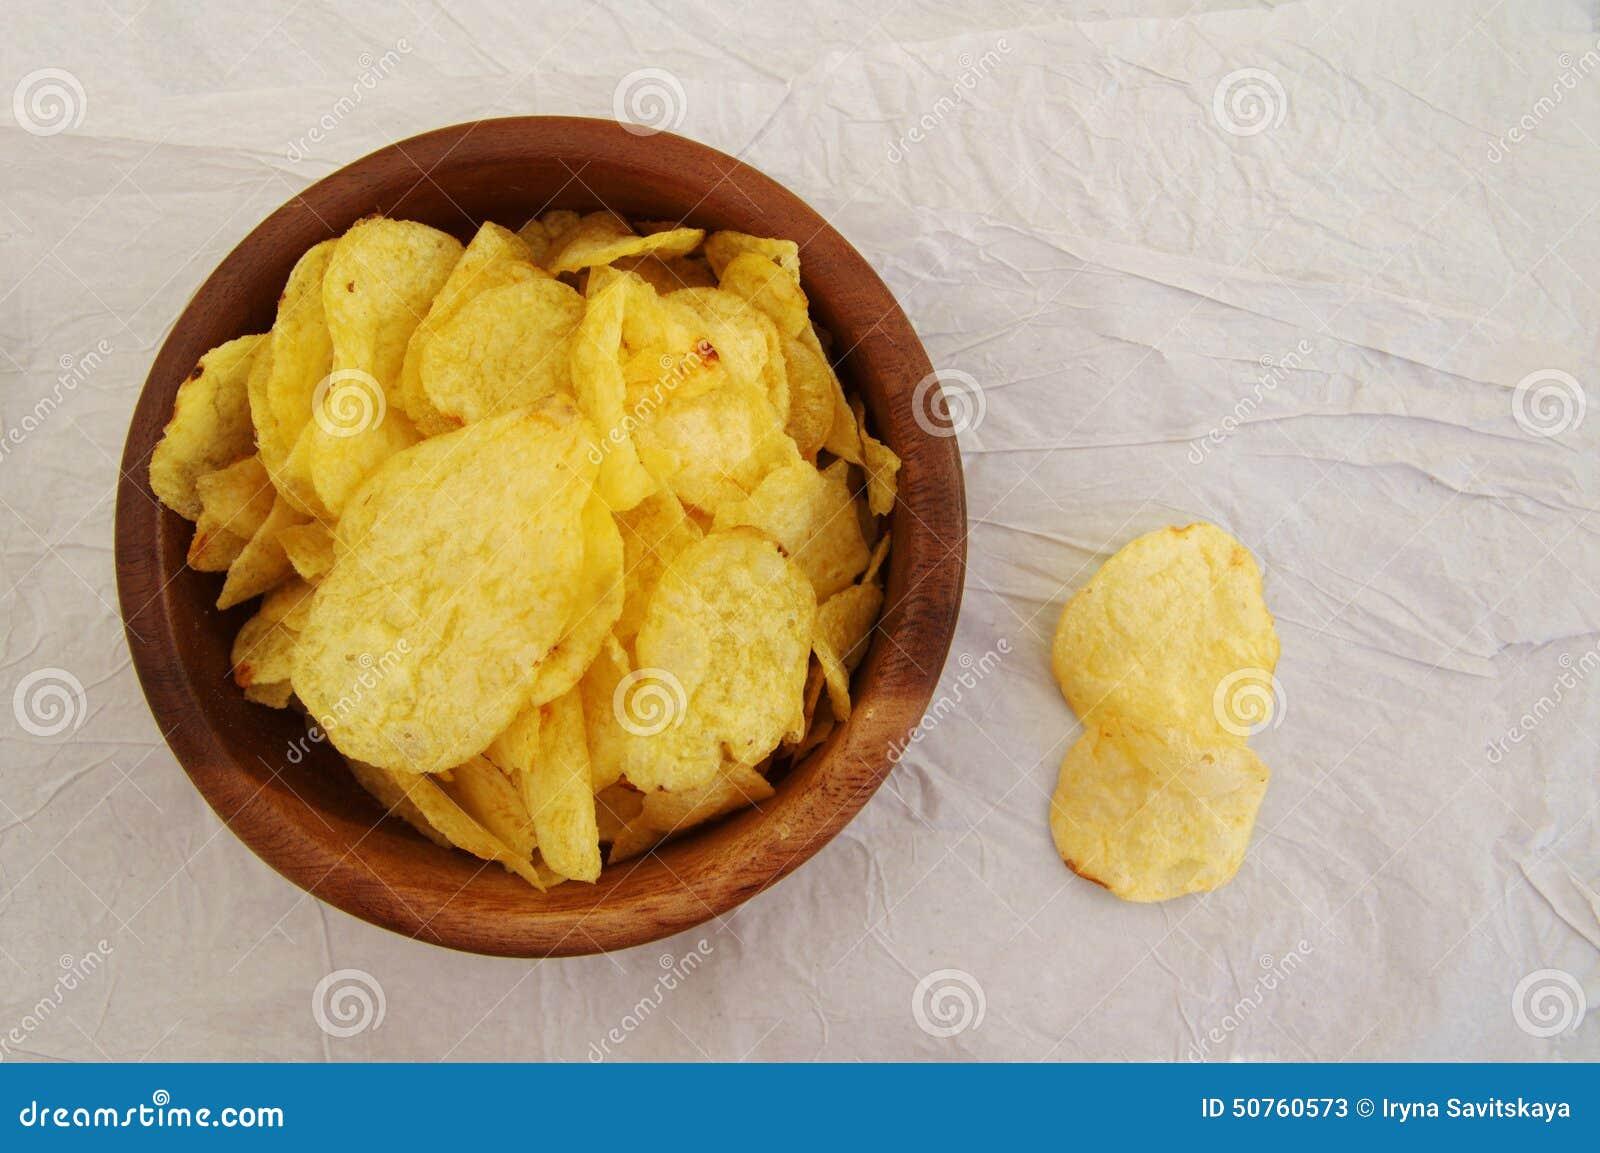 pass the potato chips essay Market-product grid for potato chips essays: over 180,000 market-product grid for potato chips essays, market-product grid for potato chips term papers, market-product grid for potato chips research paper order plagiarism free custom written essay.